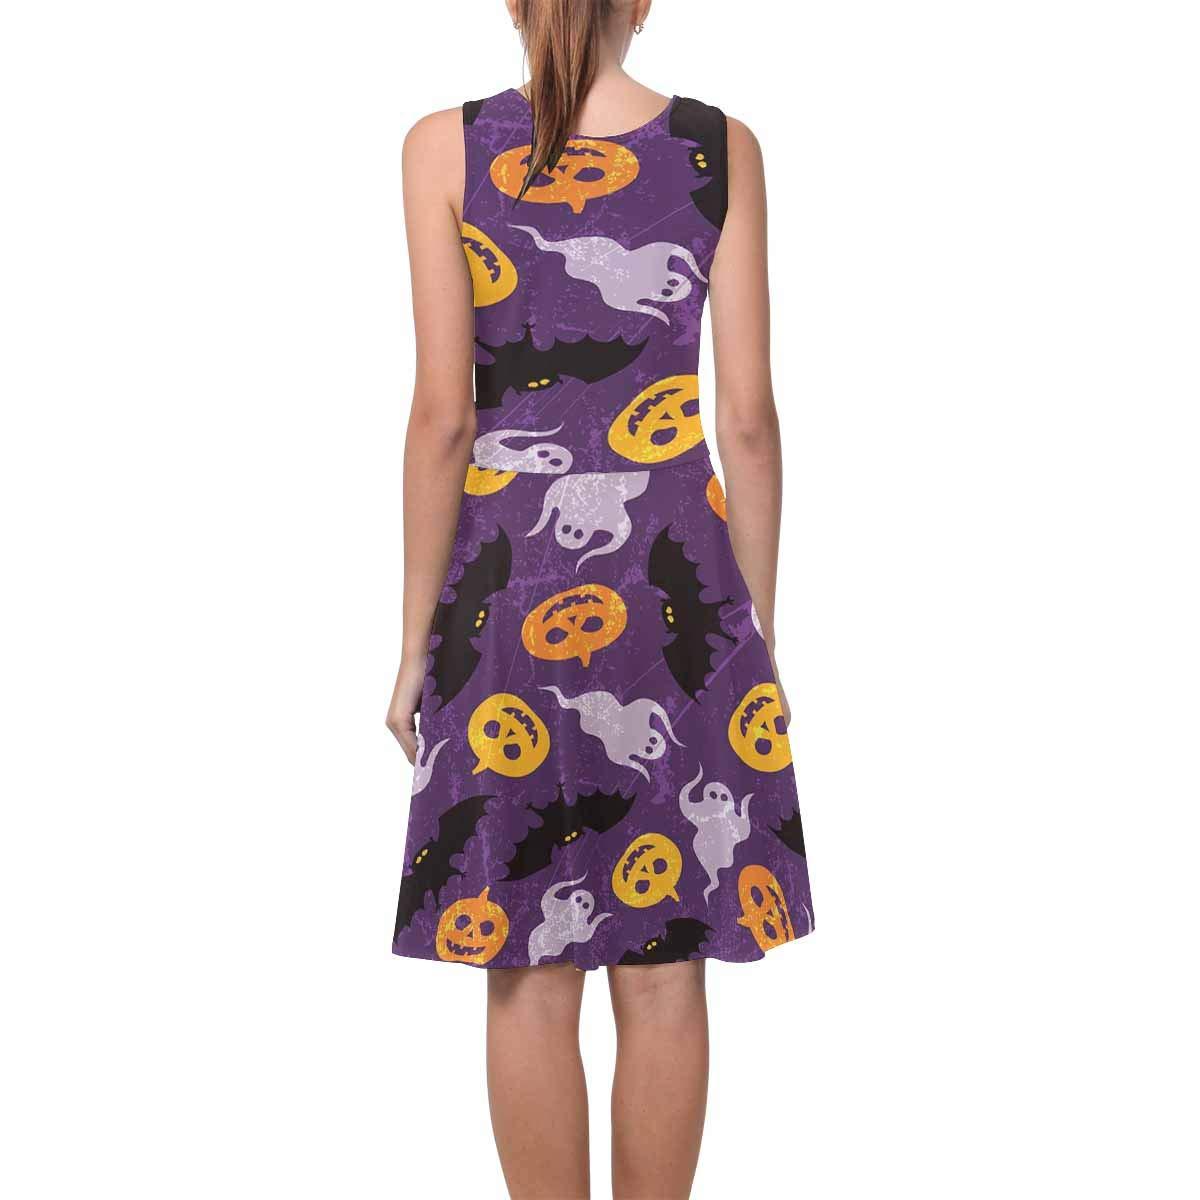 InterestPrint Womens Sleeveless Sundresses Halloween Ghosts Scoop Neck Flared Tank Dresseses XS-3XL